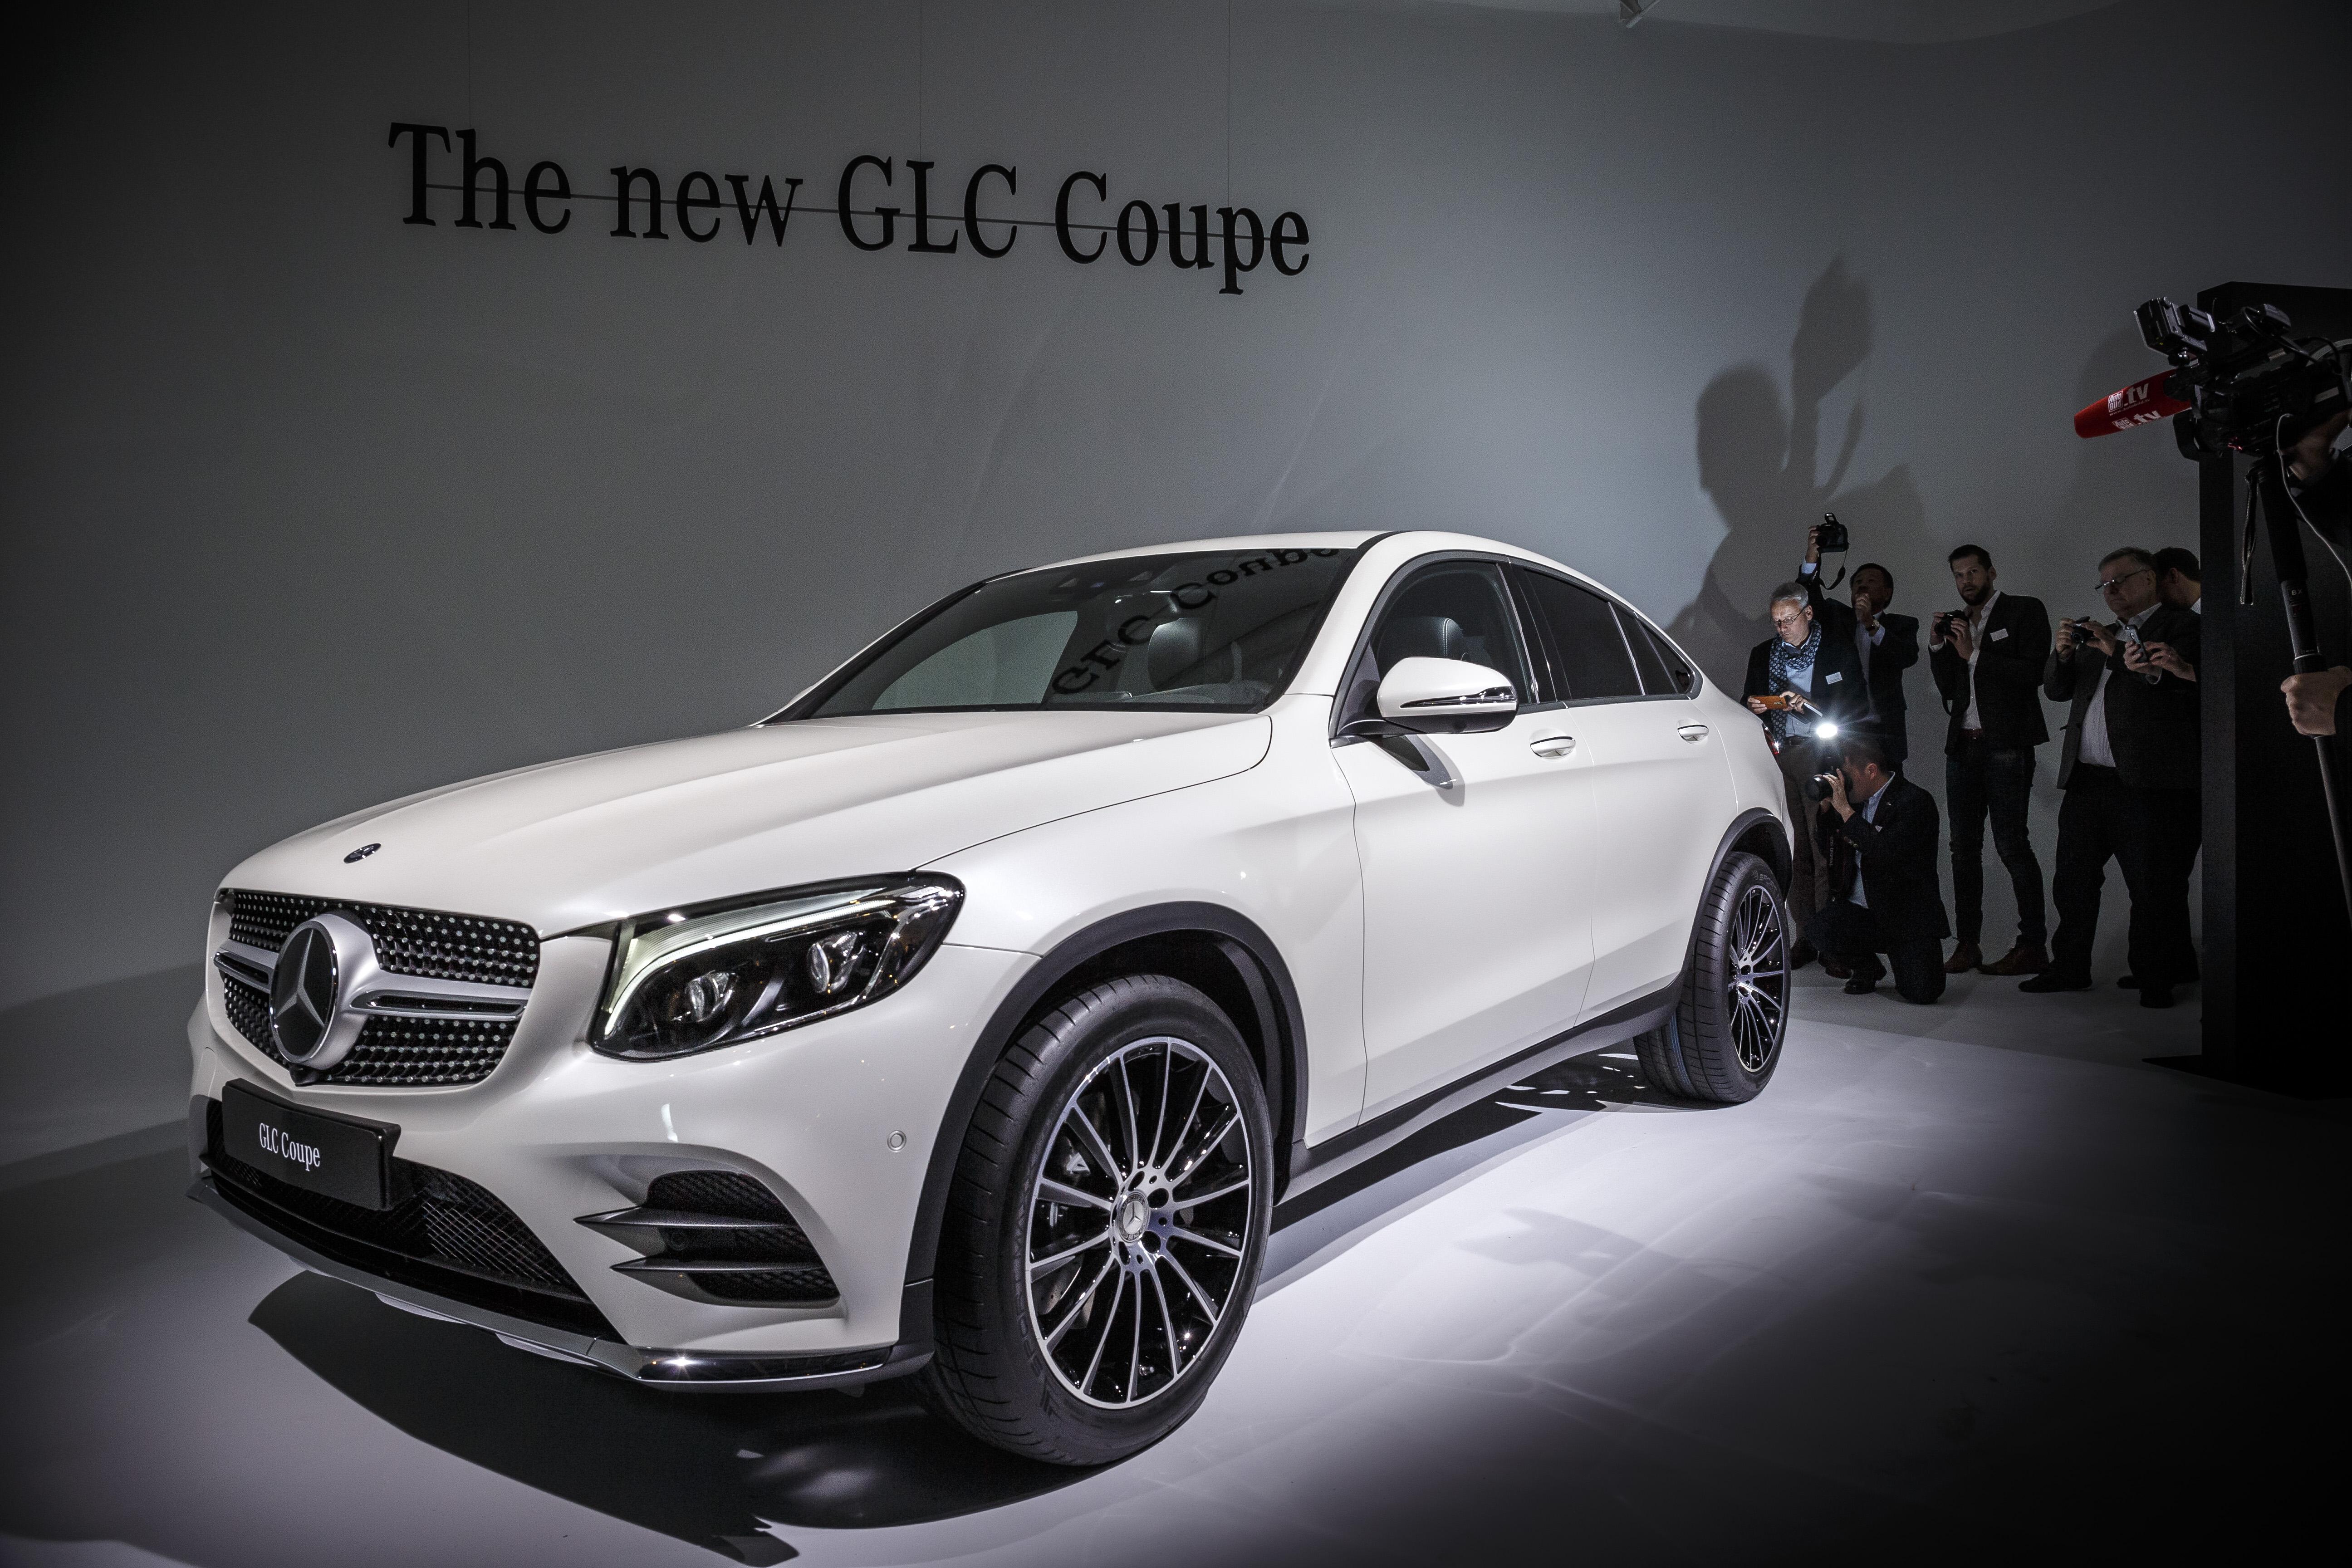 Weltpremiere des Mercedes-Benz GLC Coupé am Vorabend der New York International Auto Show 2016: World Premiere of the Mercedes-Benz GLC Coupé on the eve of the 2016 New York International Auto Show: